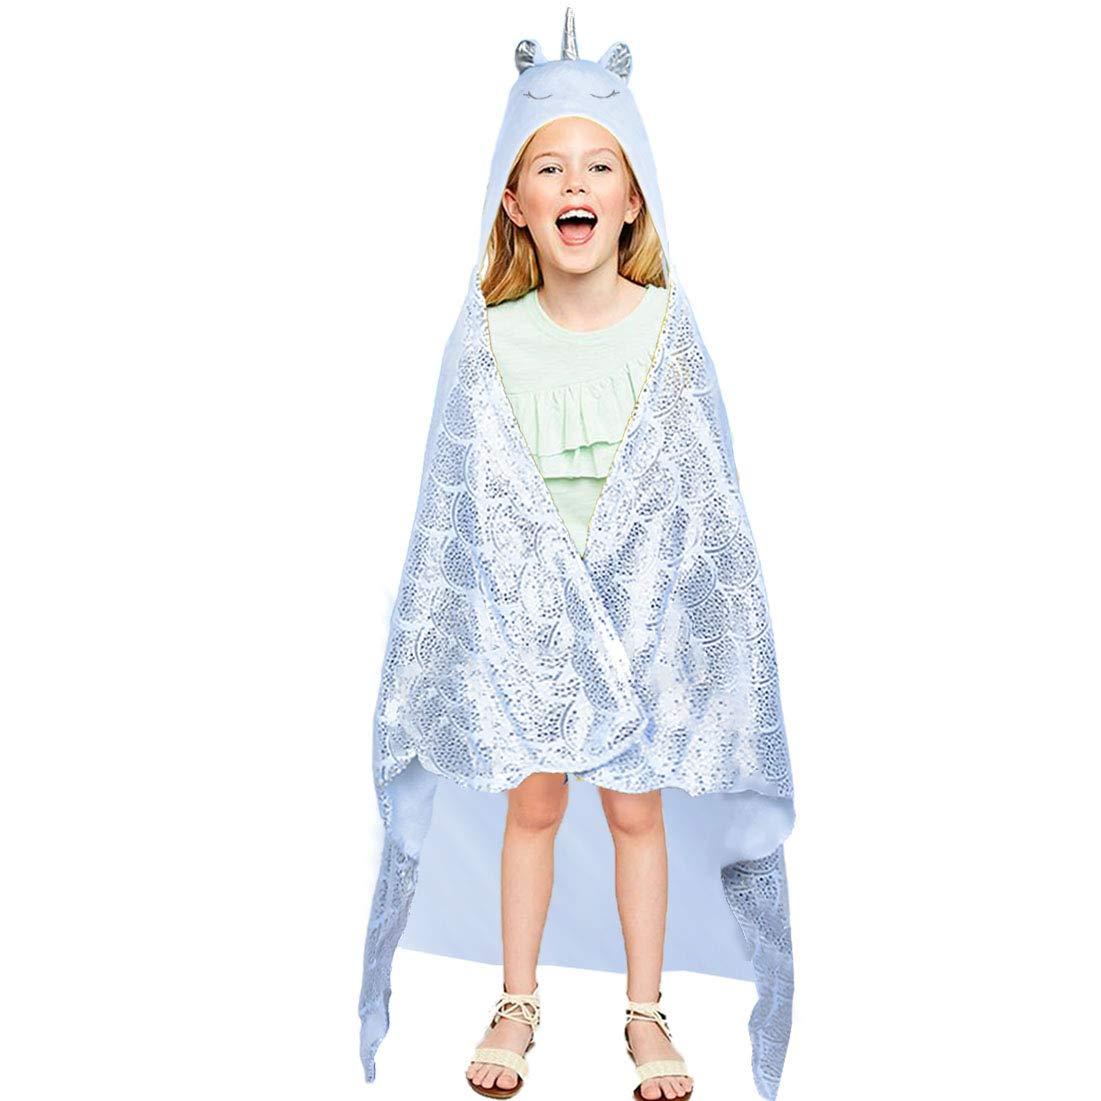 Unicorn Blanket for Kids - Hooded Wearable Cozy Blanket Unicorn Hoodie Cloak for Sleeping Traveling